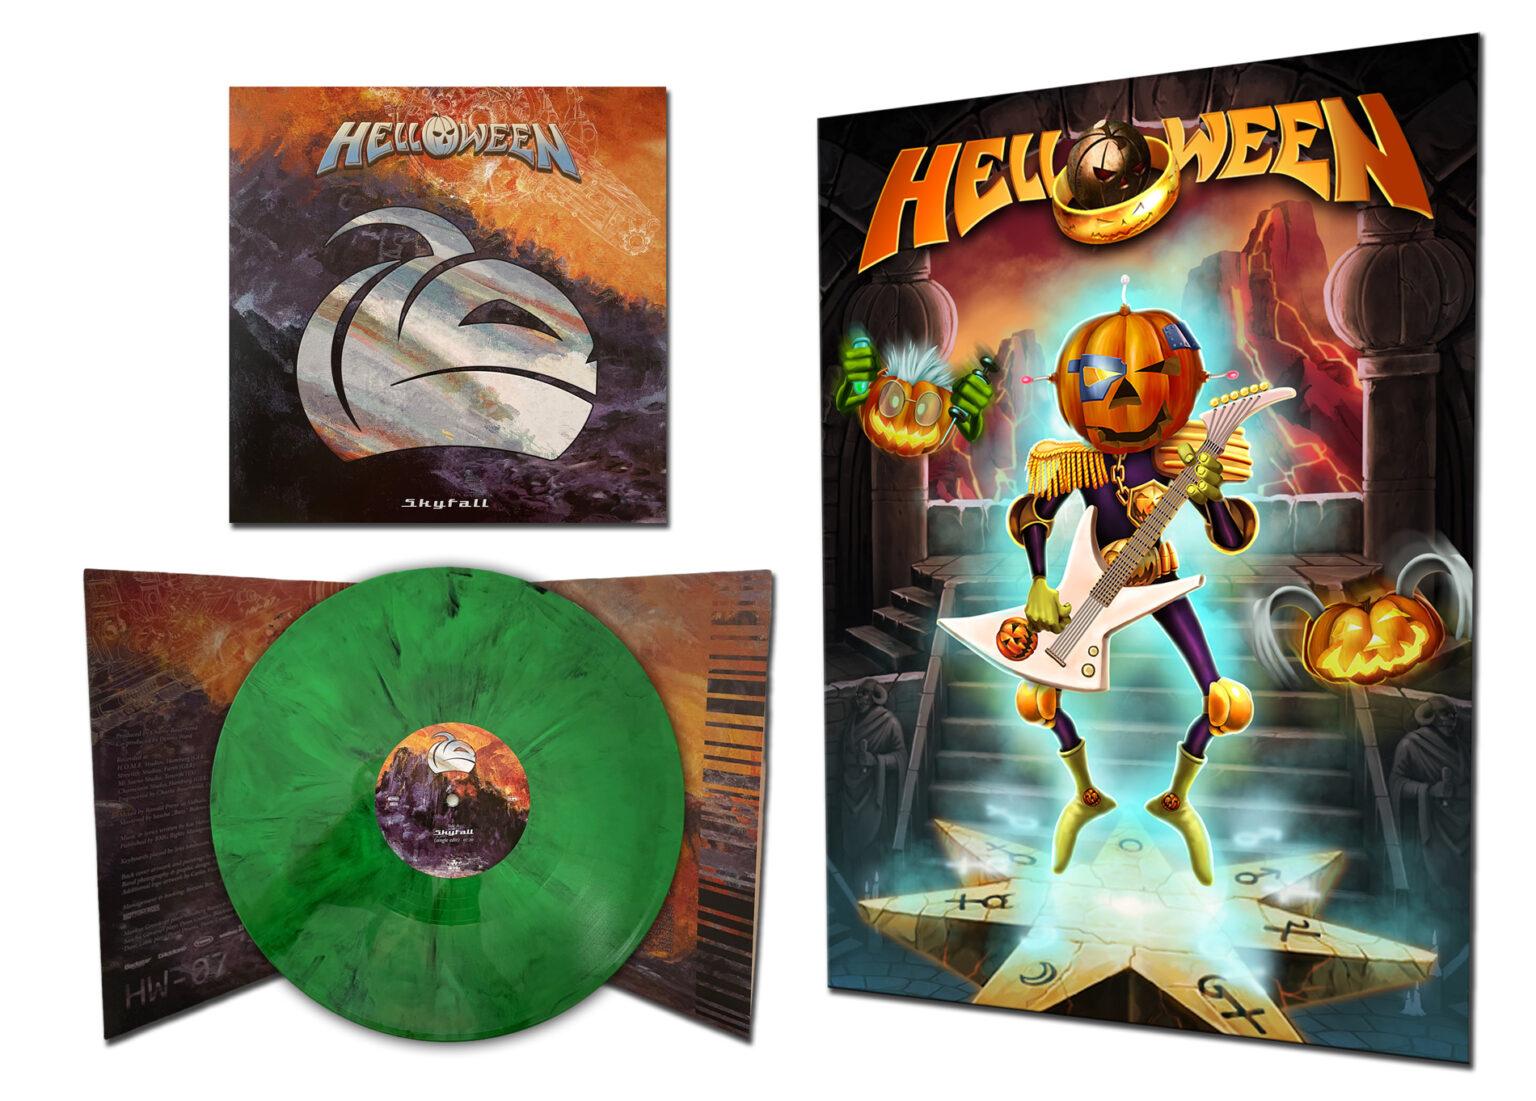 HELLOWEEN 'Skyfall' 2021 EP on green marbled vinyl + exclusive bonus poster